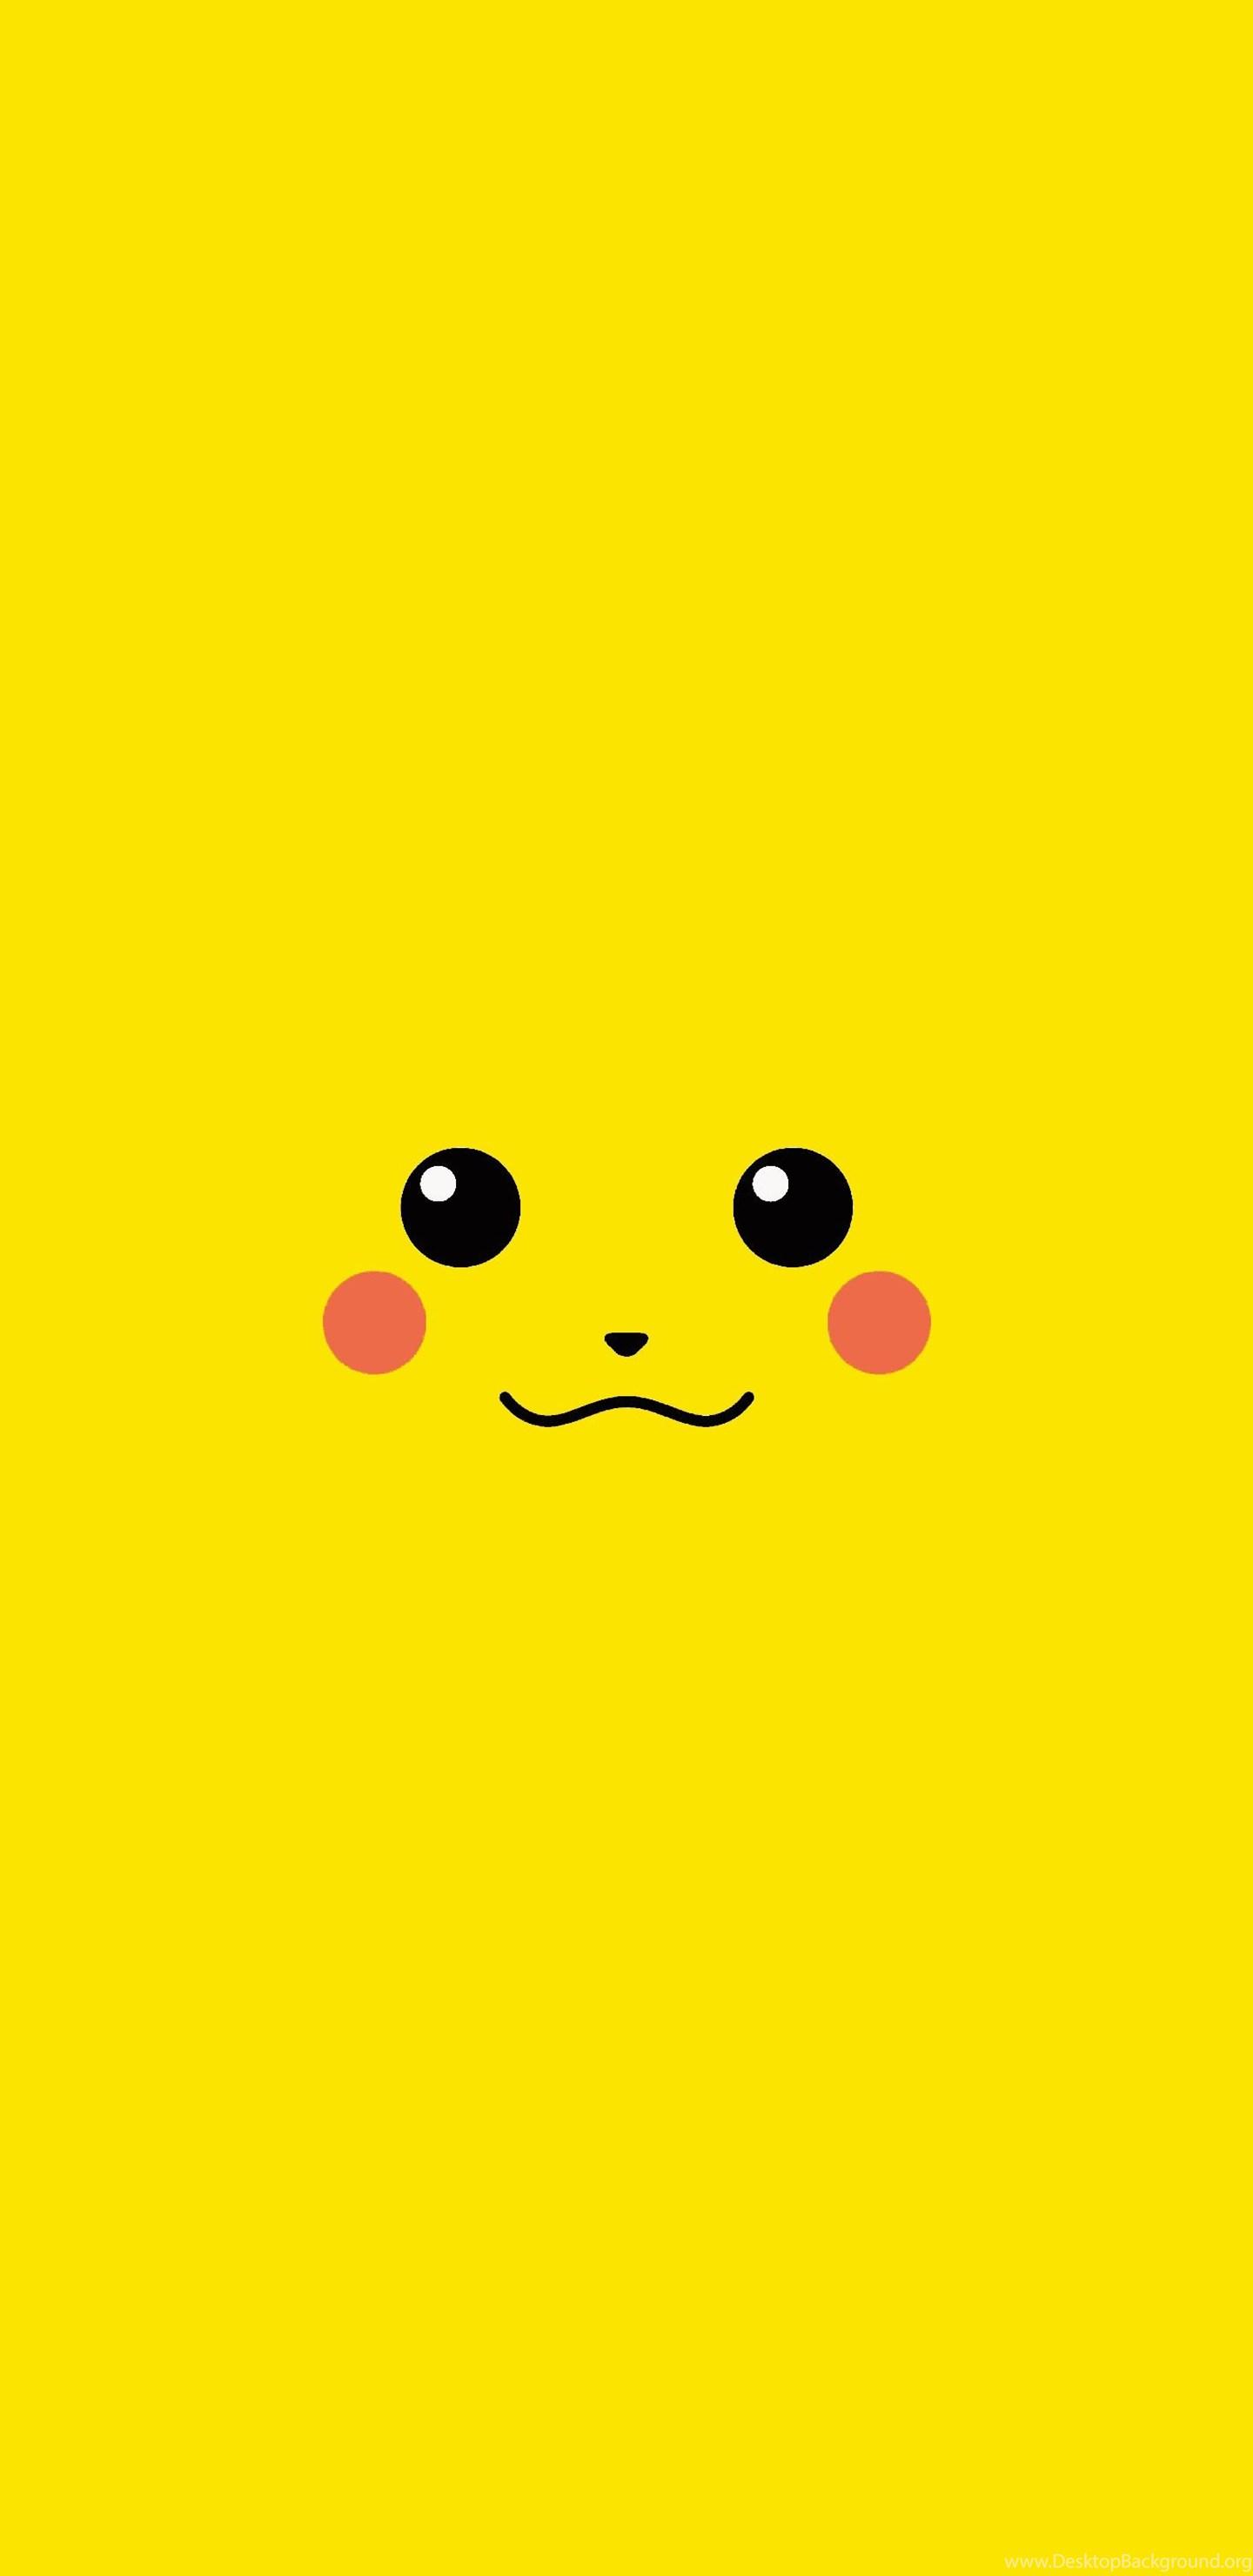 Yellow Pikachu Wallpapers Desktop Background